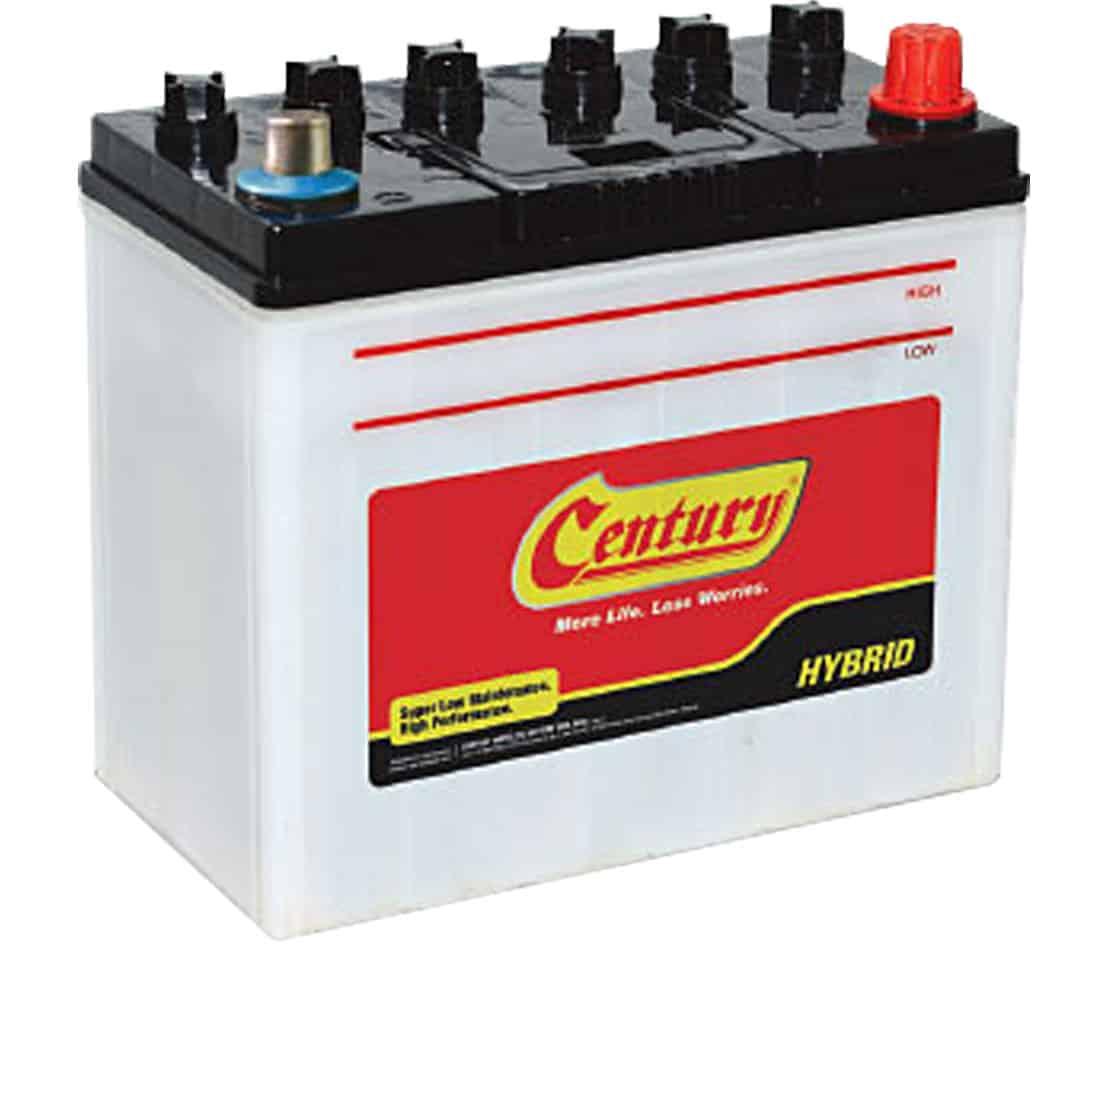 Century Hybrid Battery